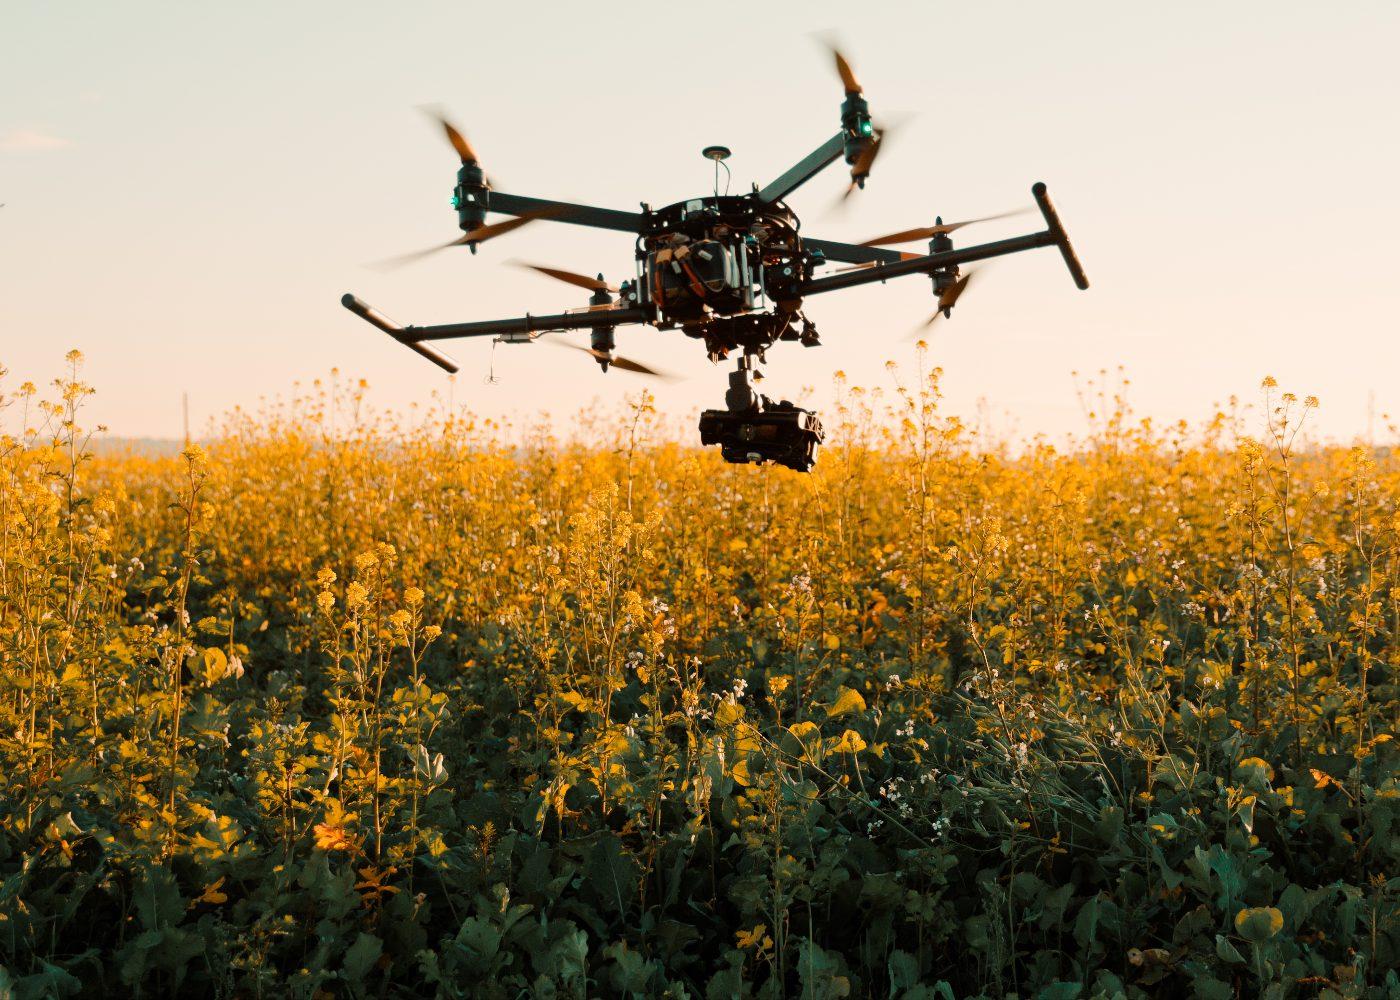 Drone a sobrevoar campo